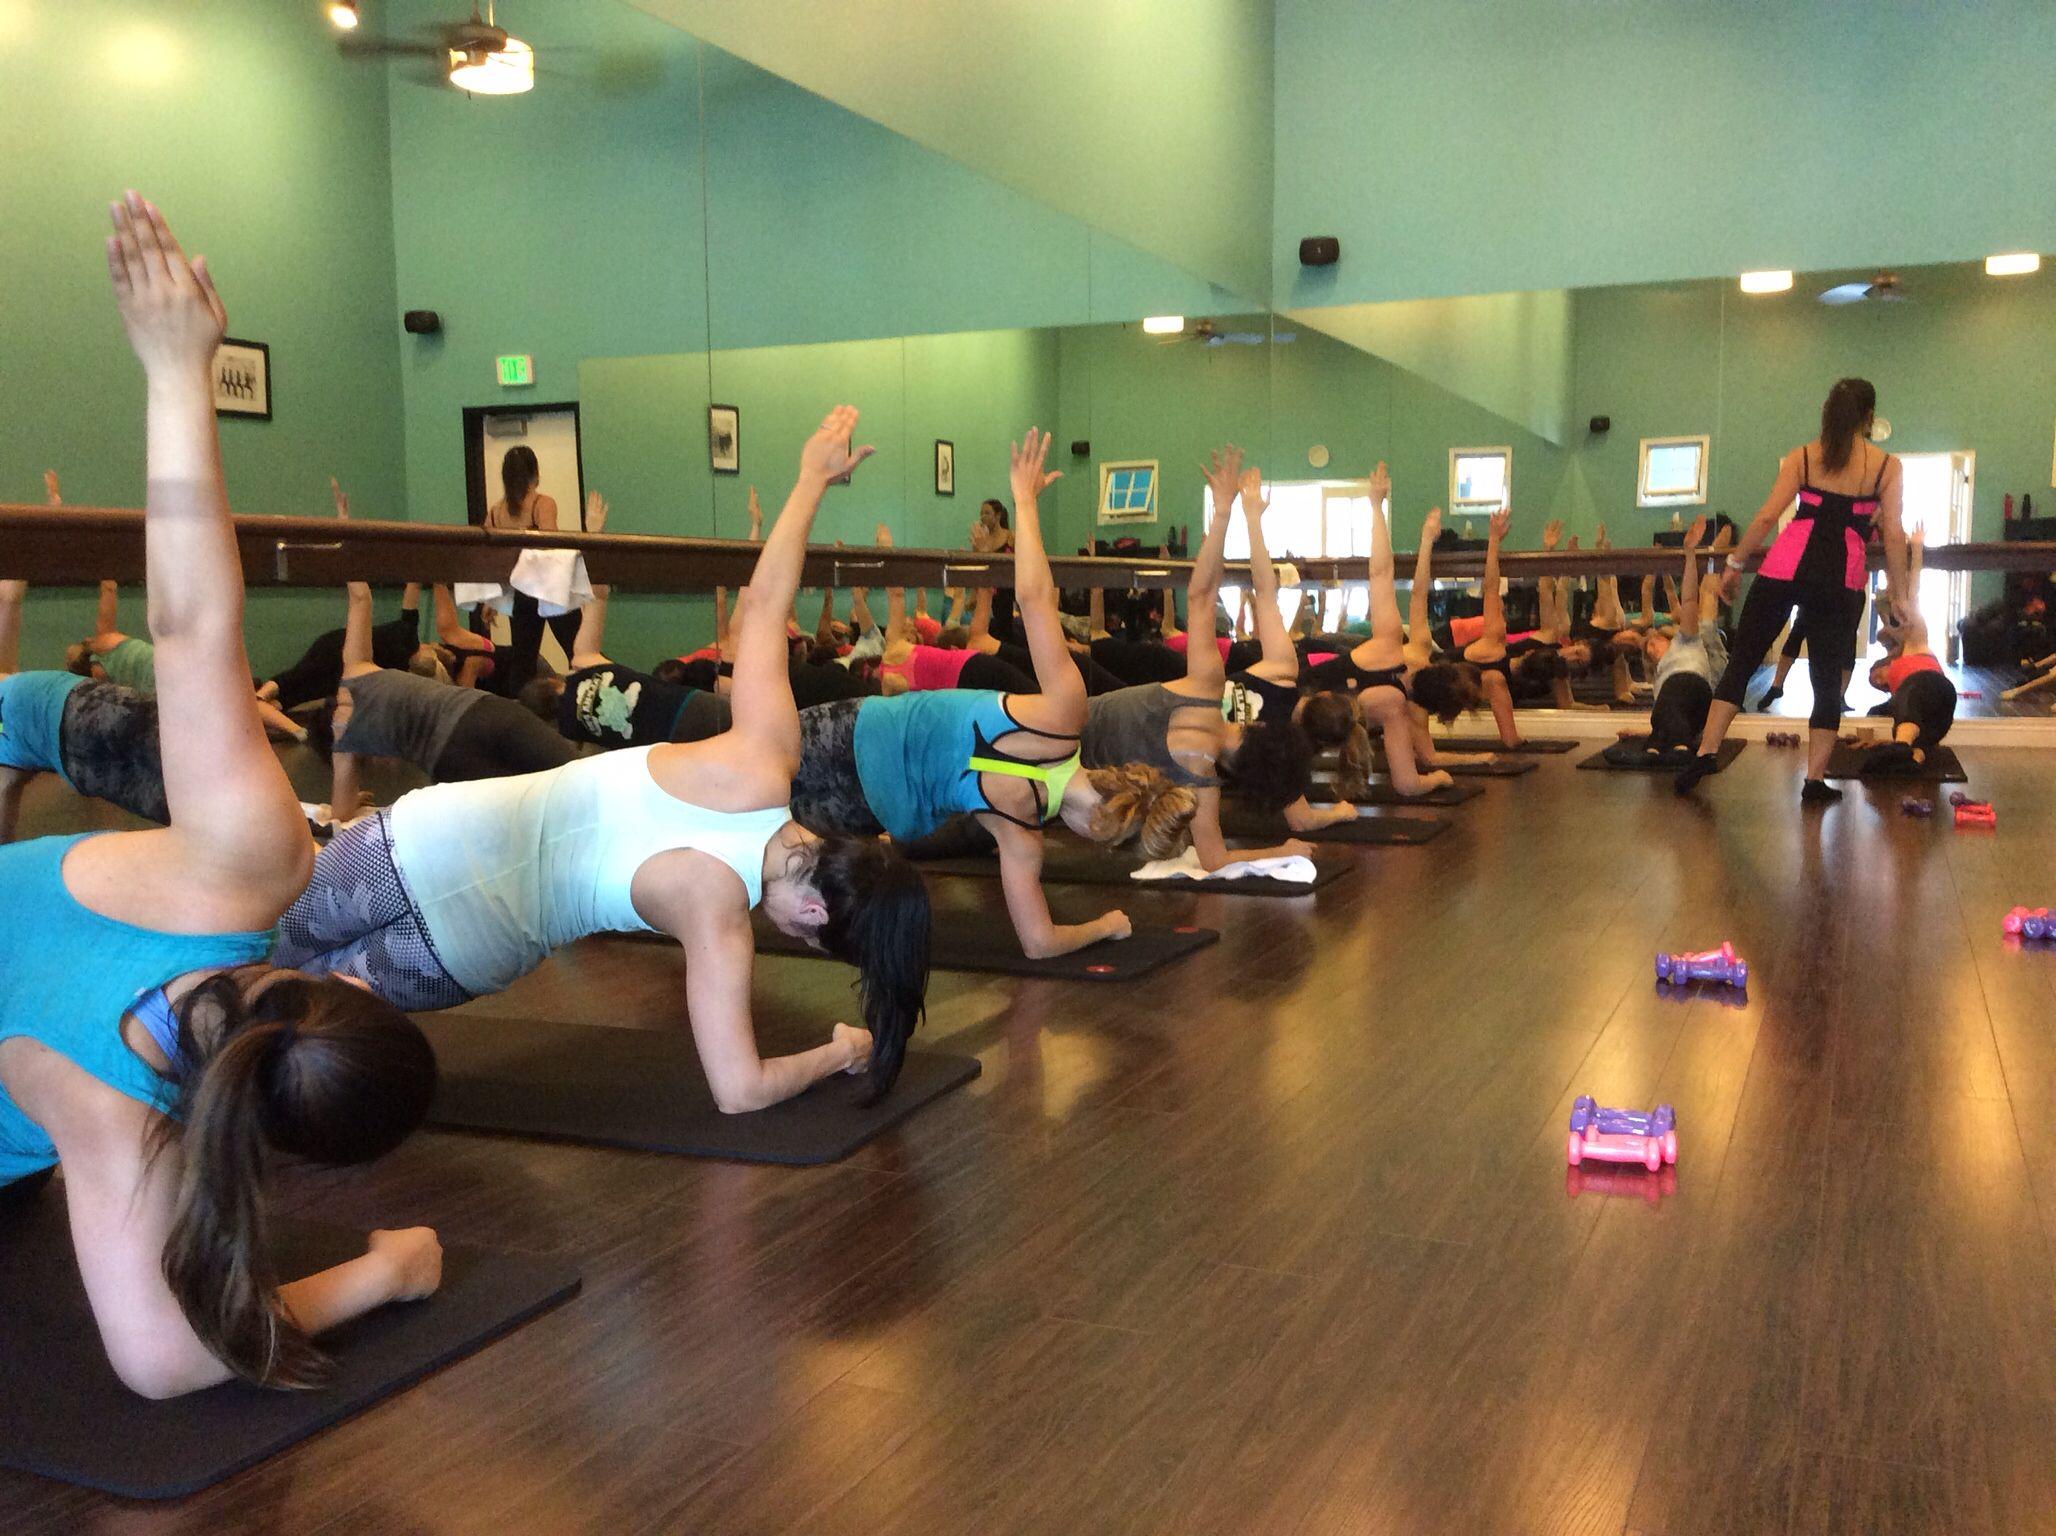 Barre camp barre workout